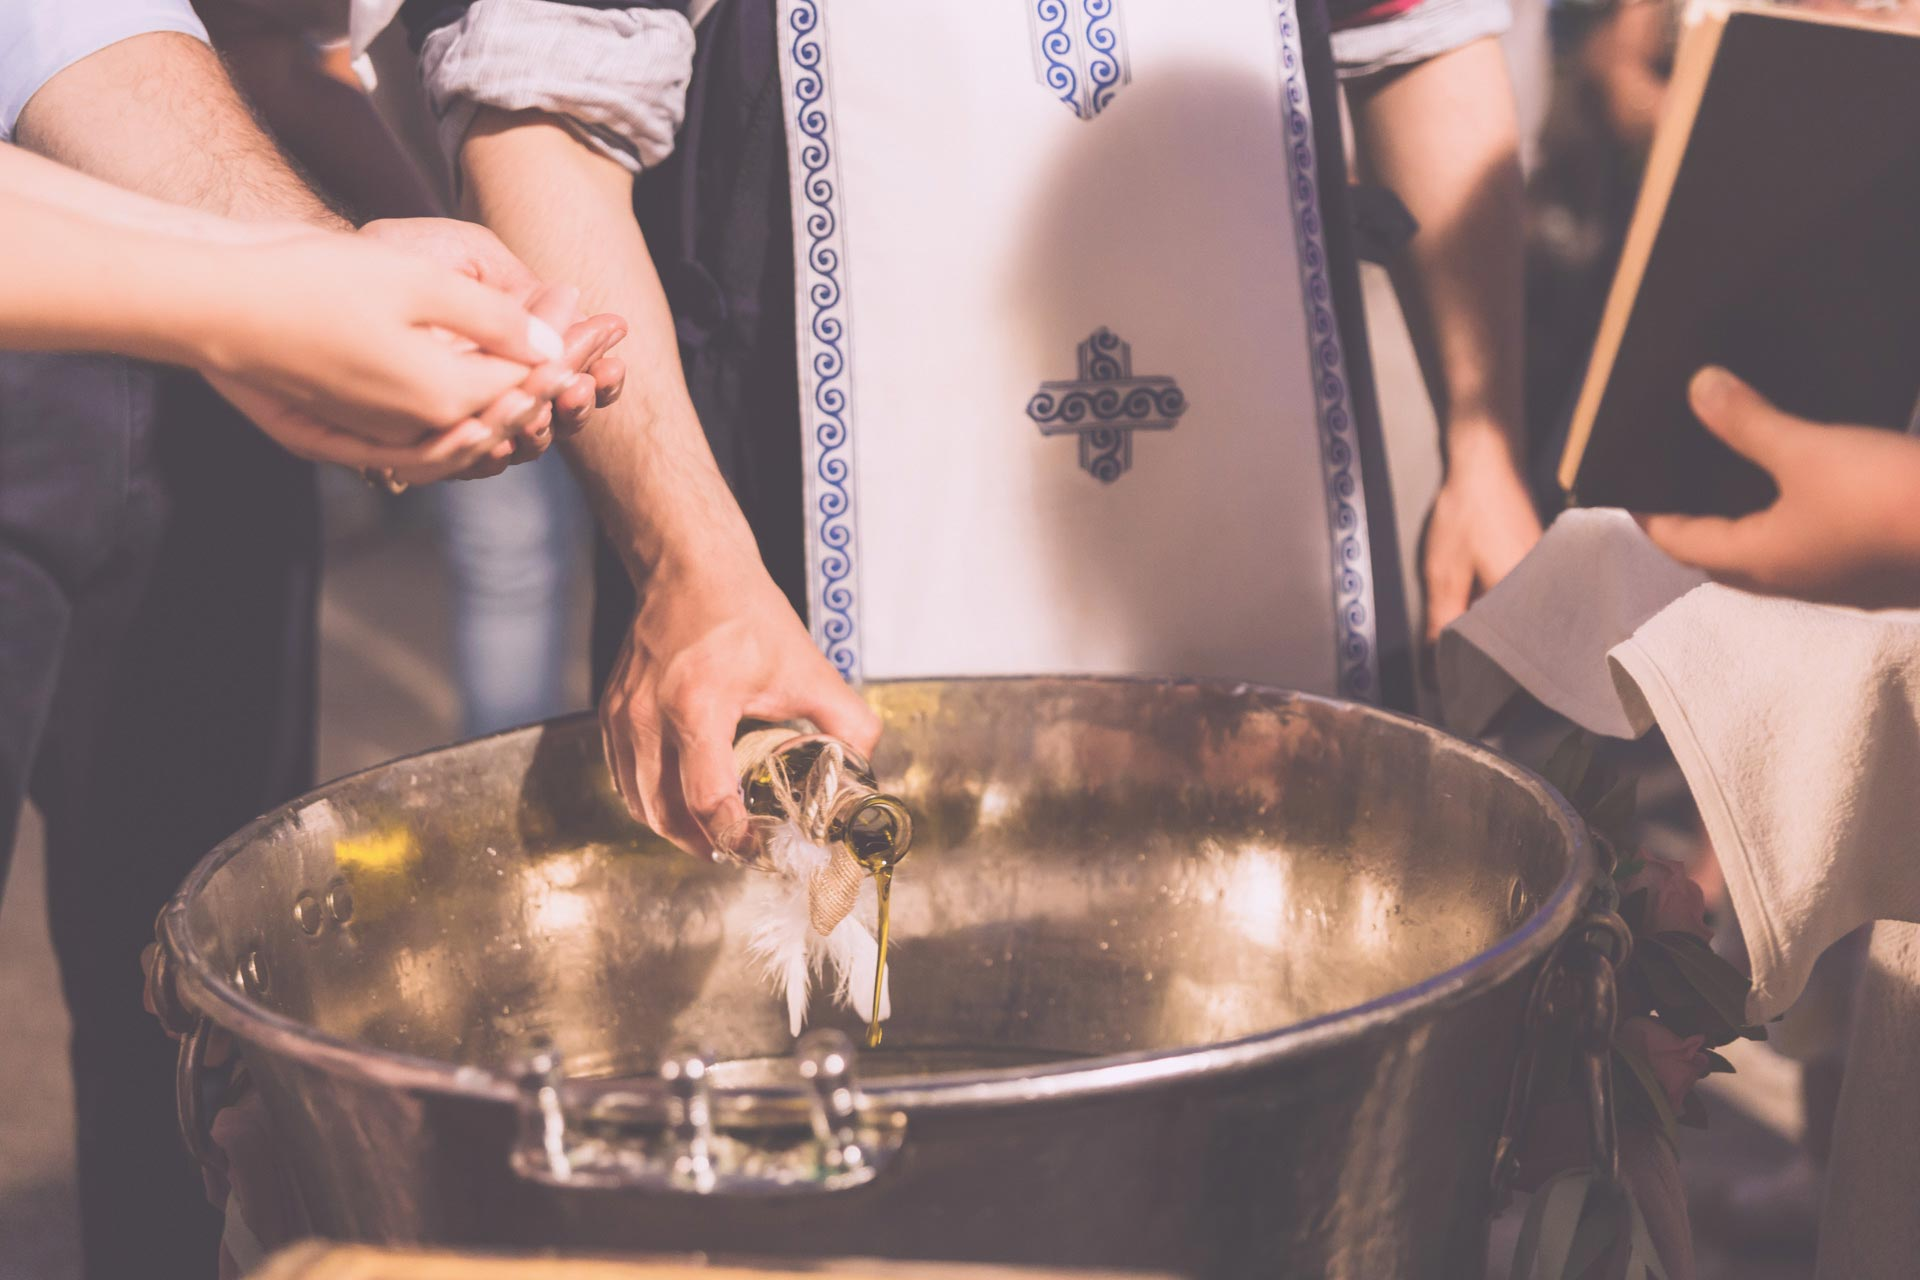 317 PhotoVaptisis Spetses vaptisi βαπτιση μωρο βαπτιστικά βαπριση σπετσες αγιος μαμας διακοσμηση βάπτισης γονείς νονά